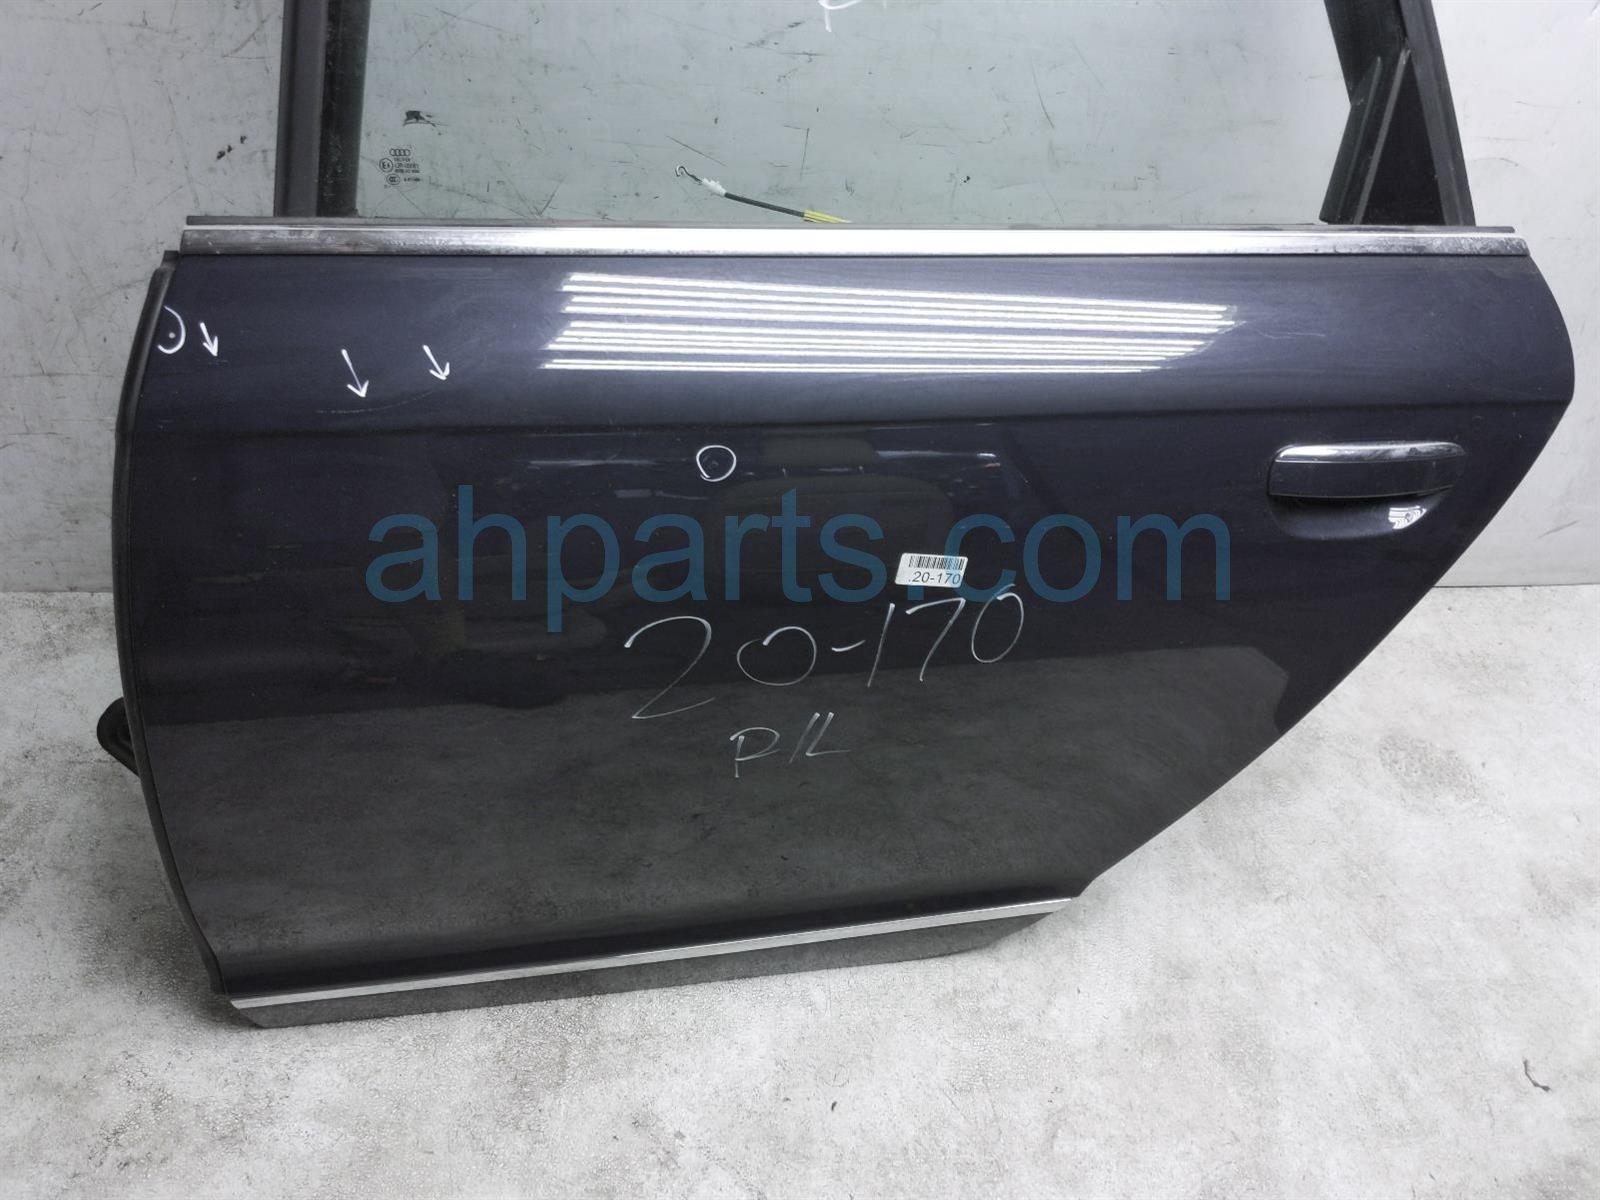 2011 Audi A6 Audi Rear Driver Door   Blue   No Inside Trim 4F0 833 051 G Replacement